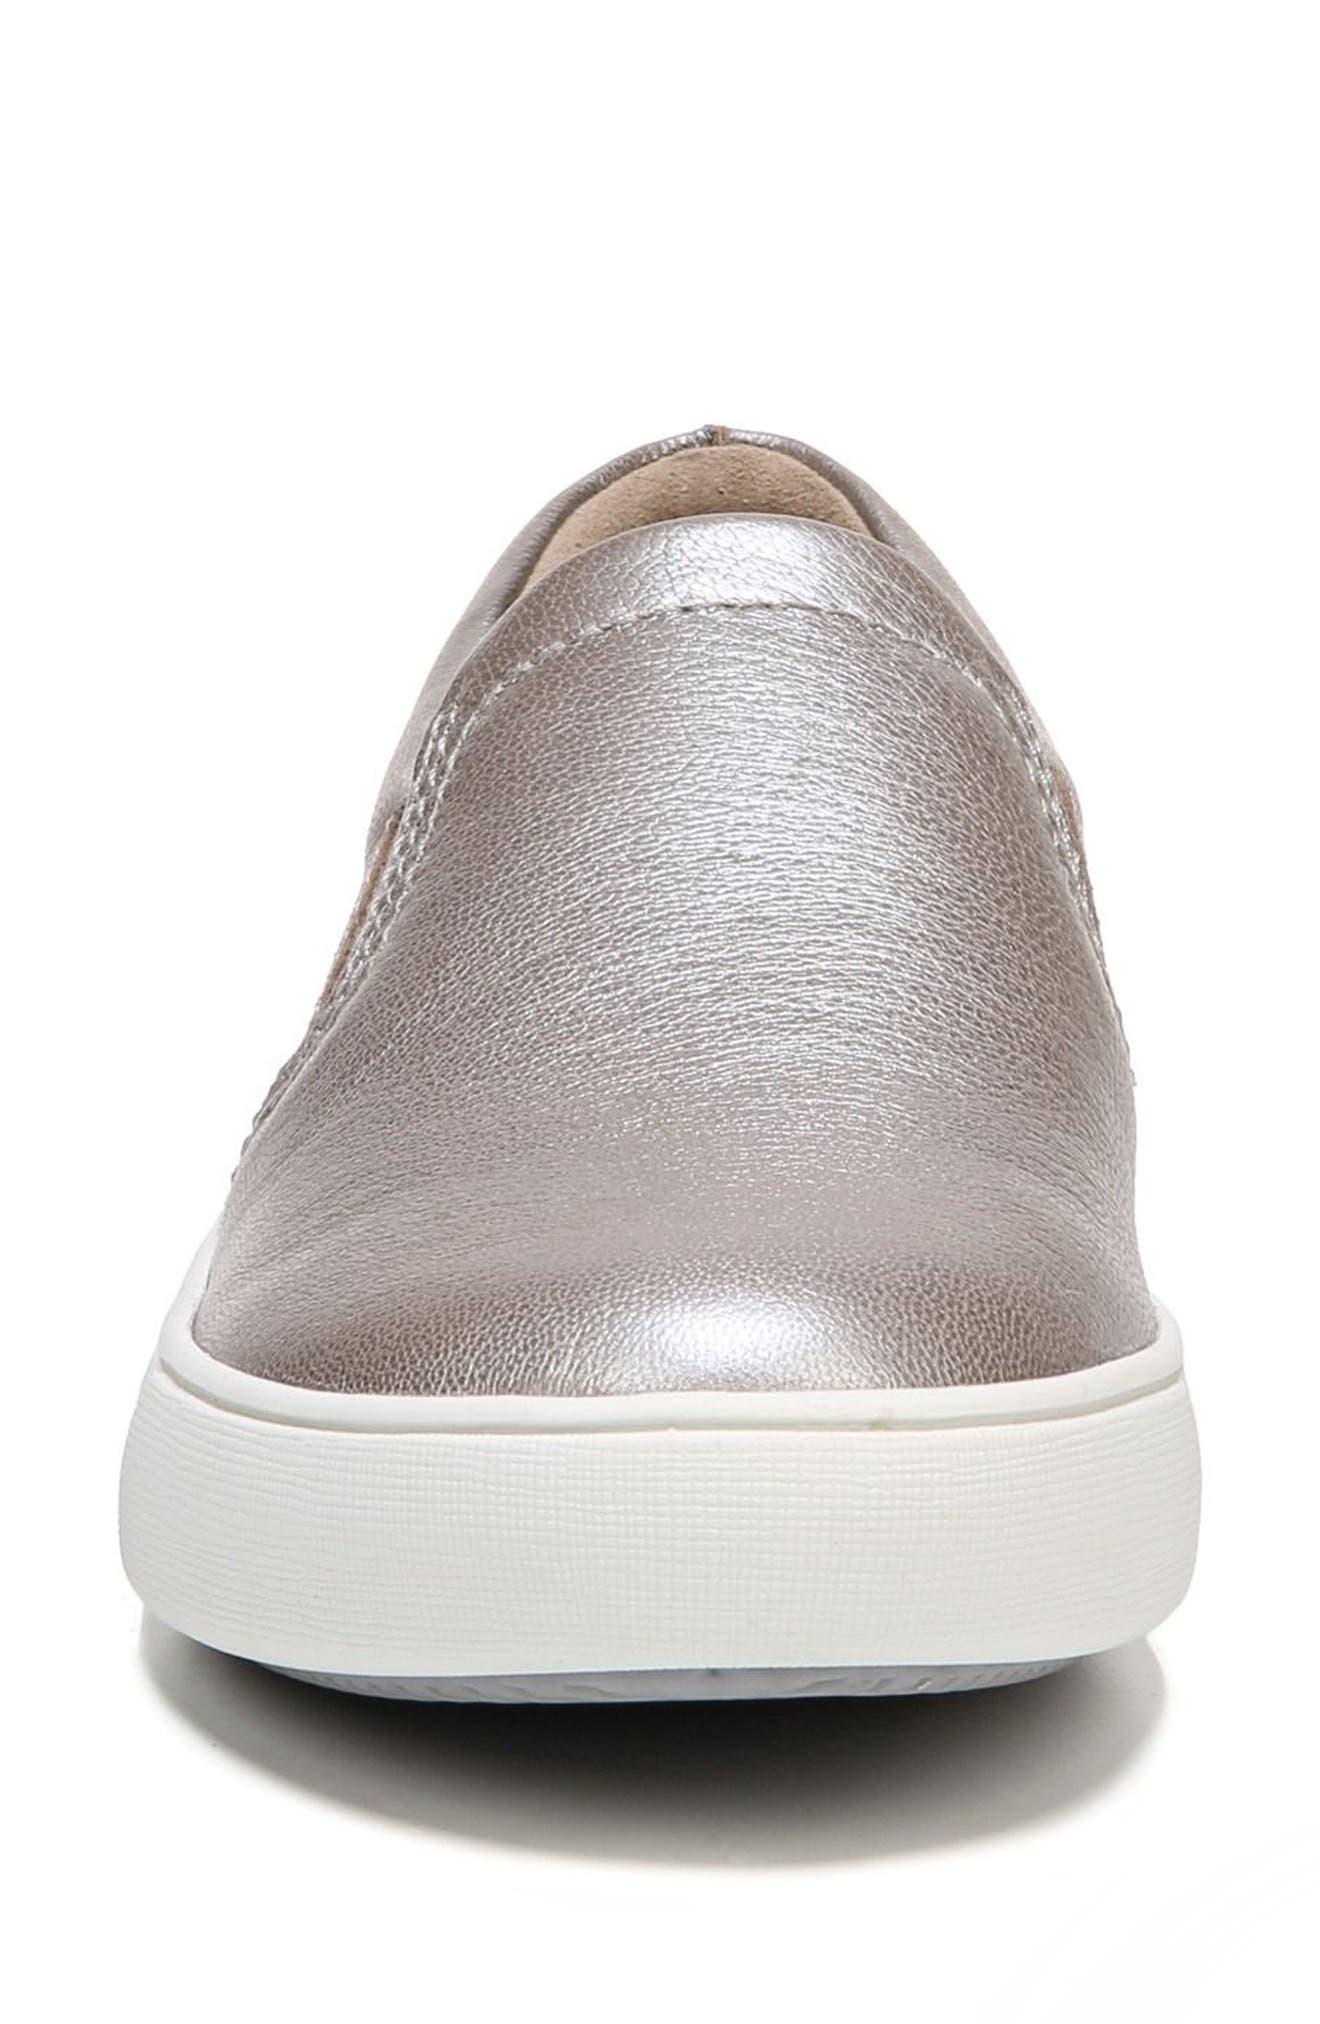 Marianne Slip-On Sneaker,                             Alternate thumbnail 4, color,                             SILVER LEATHER